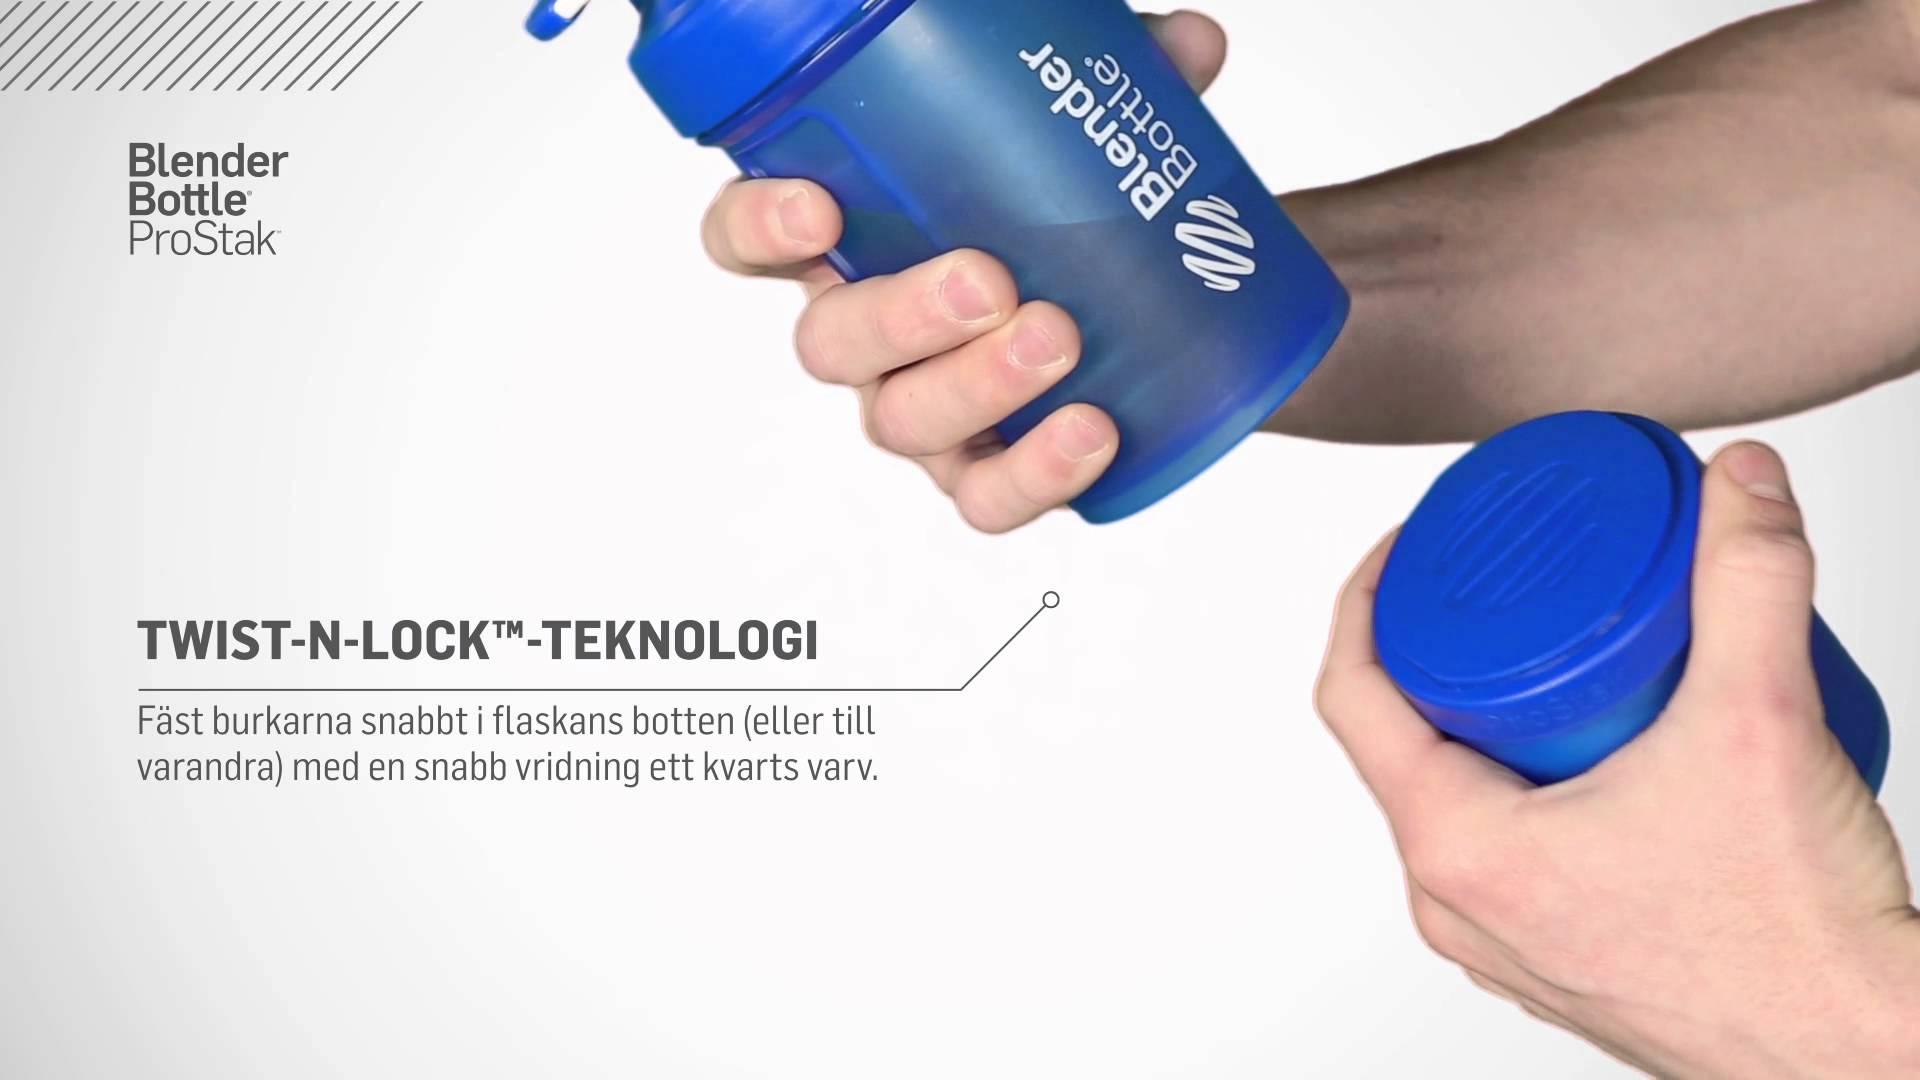 Шейкер с контейнерами (Blender Bottle) ProStak 600мл